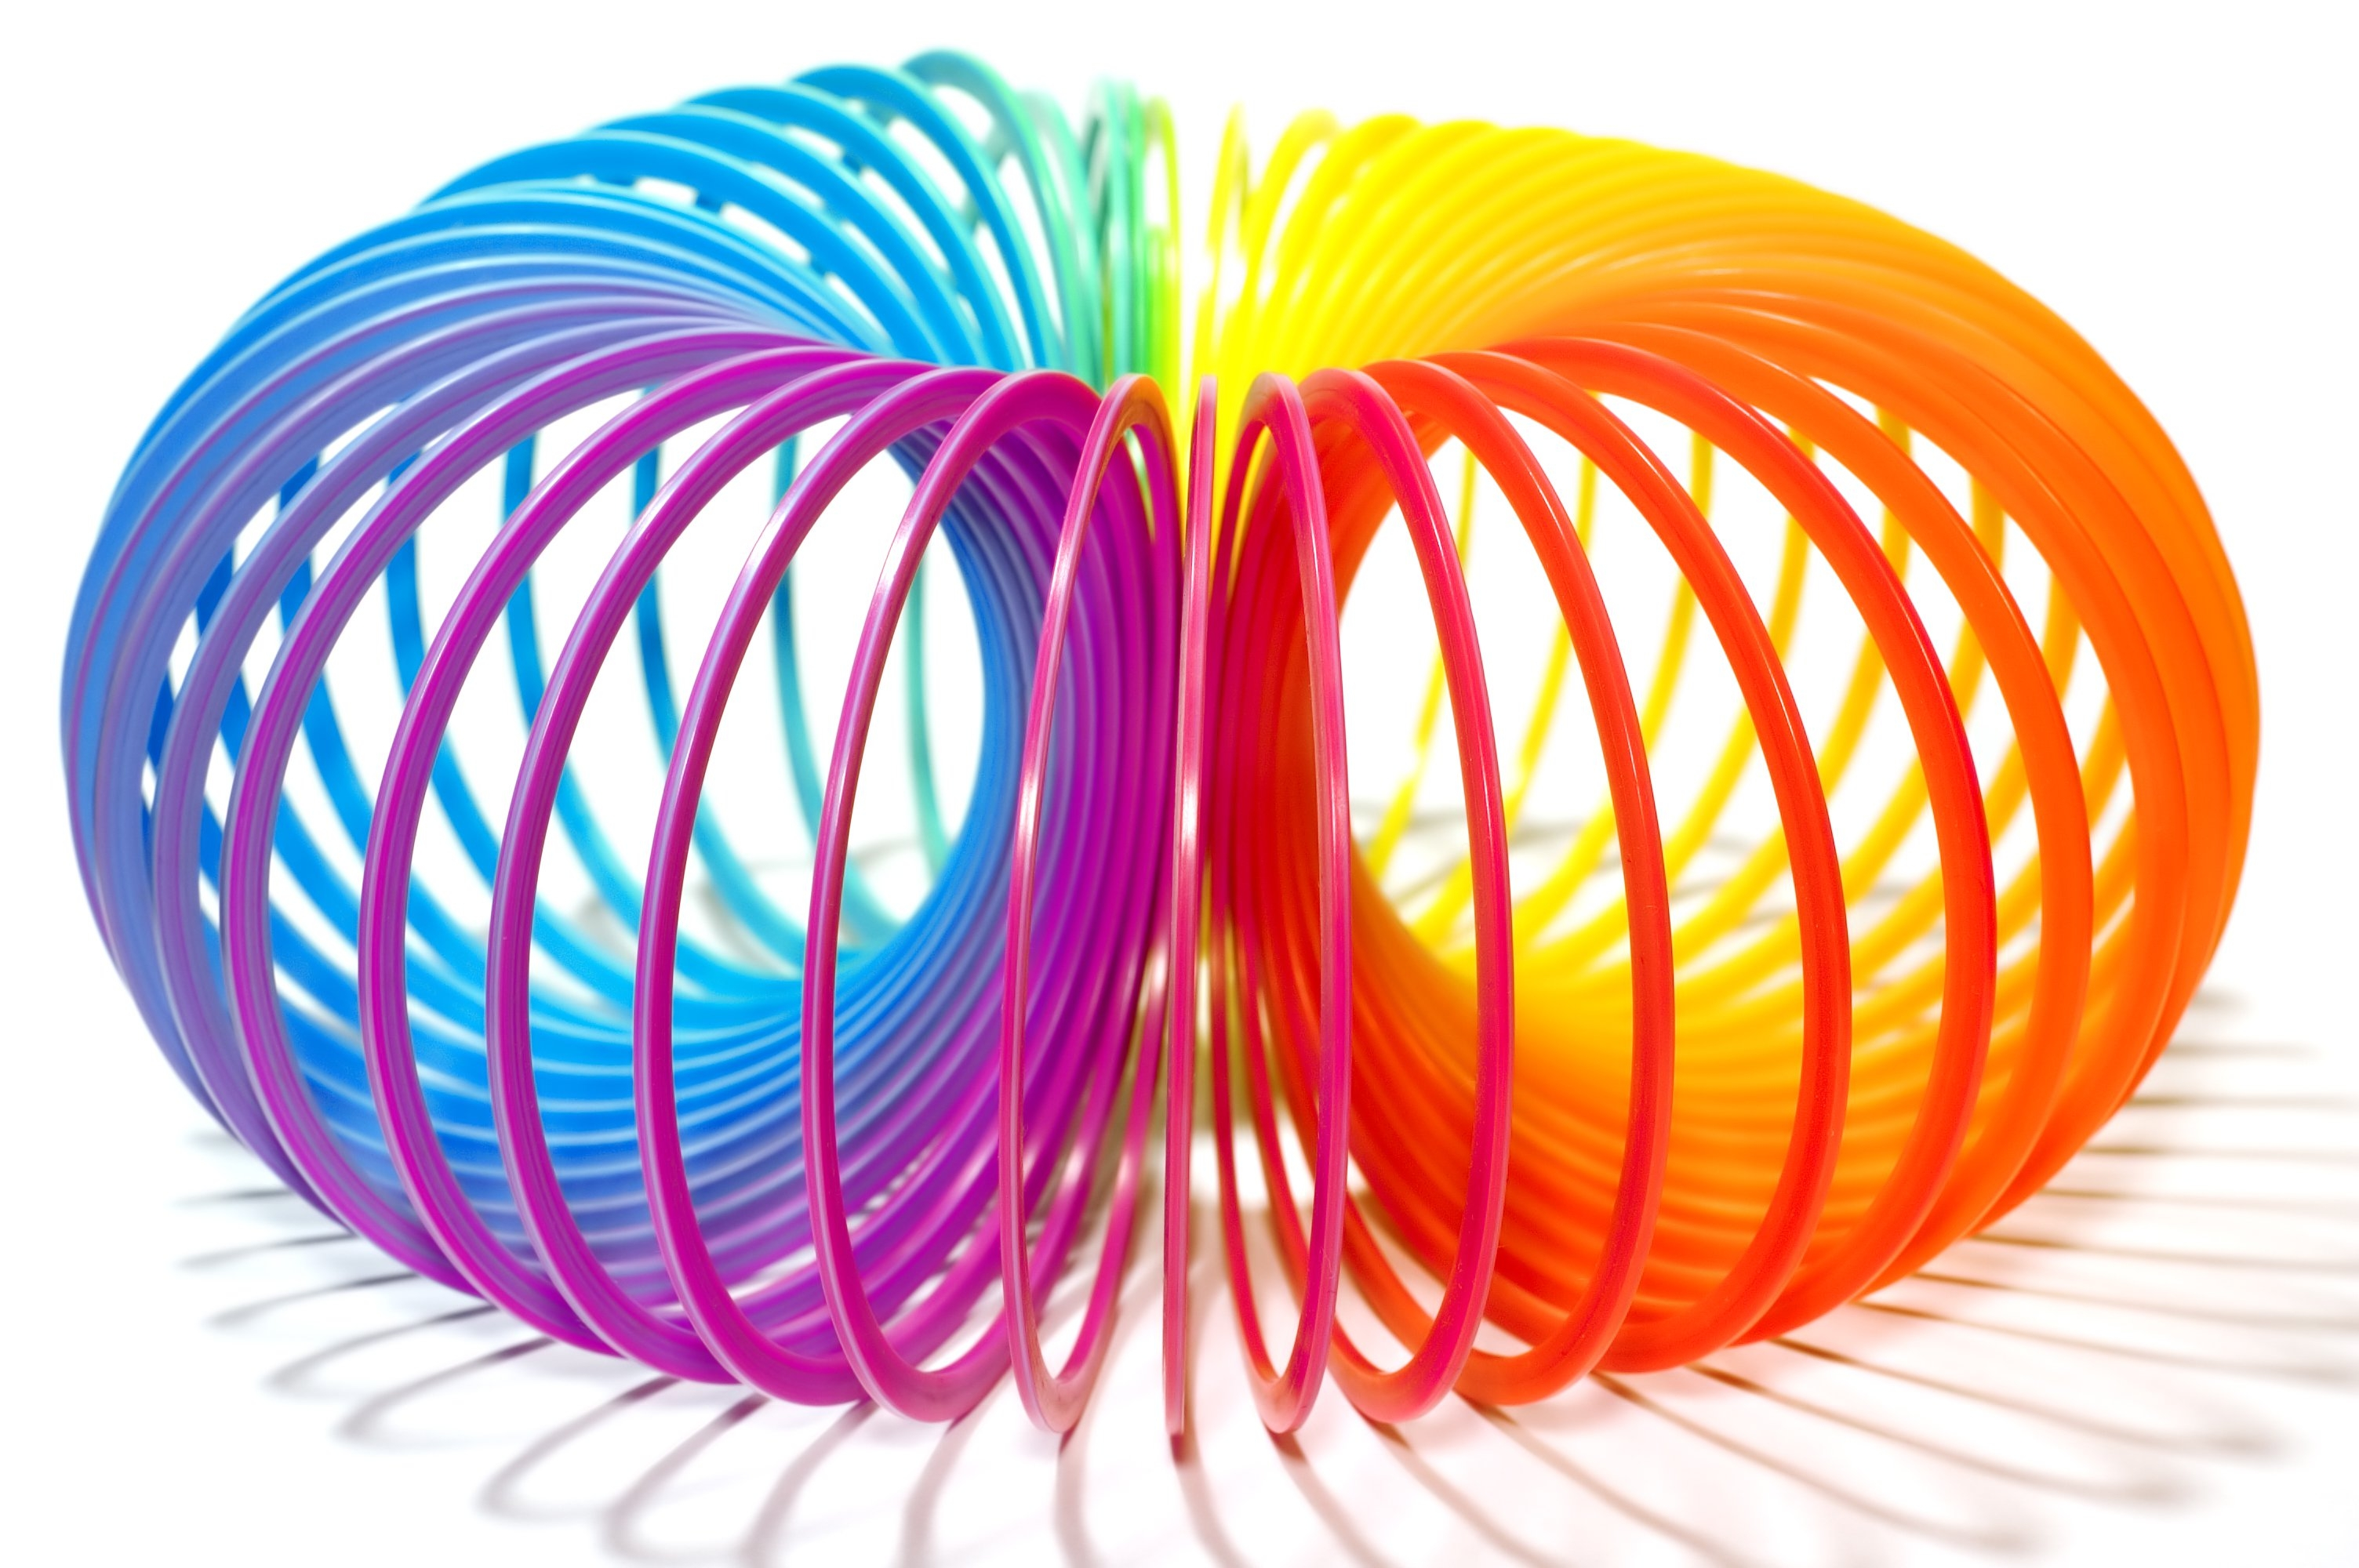 Slinky Day 2019